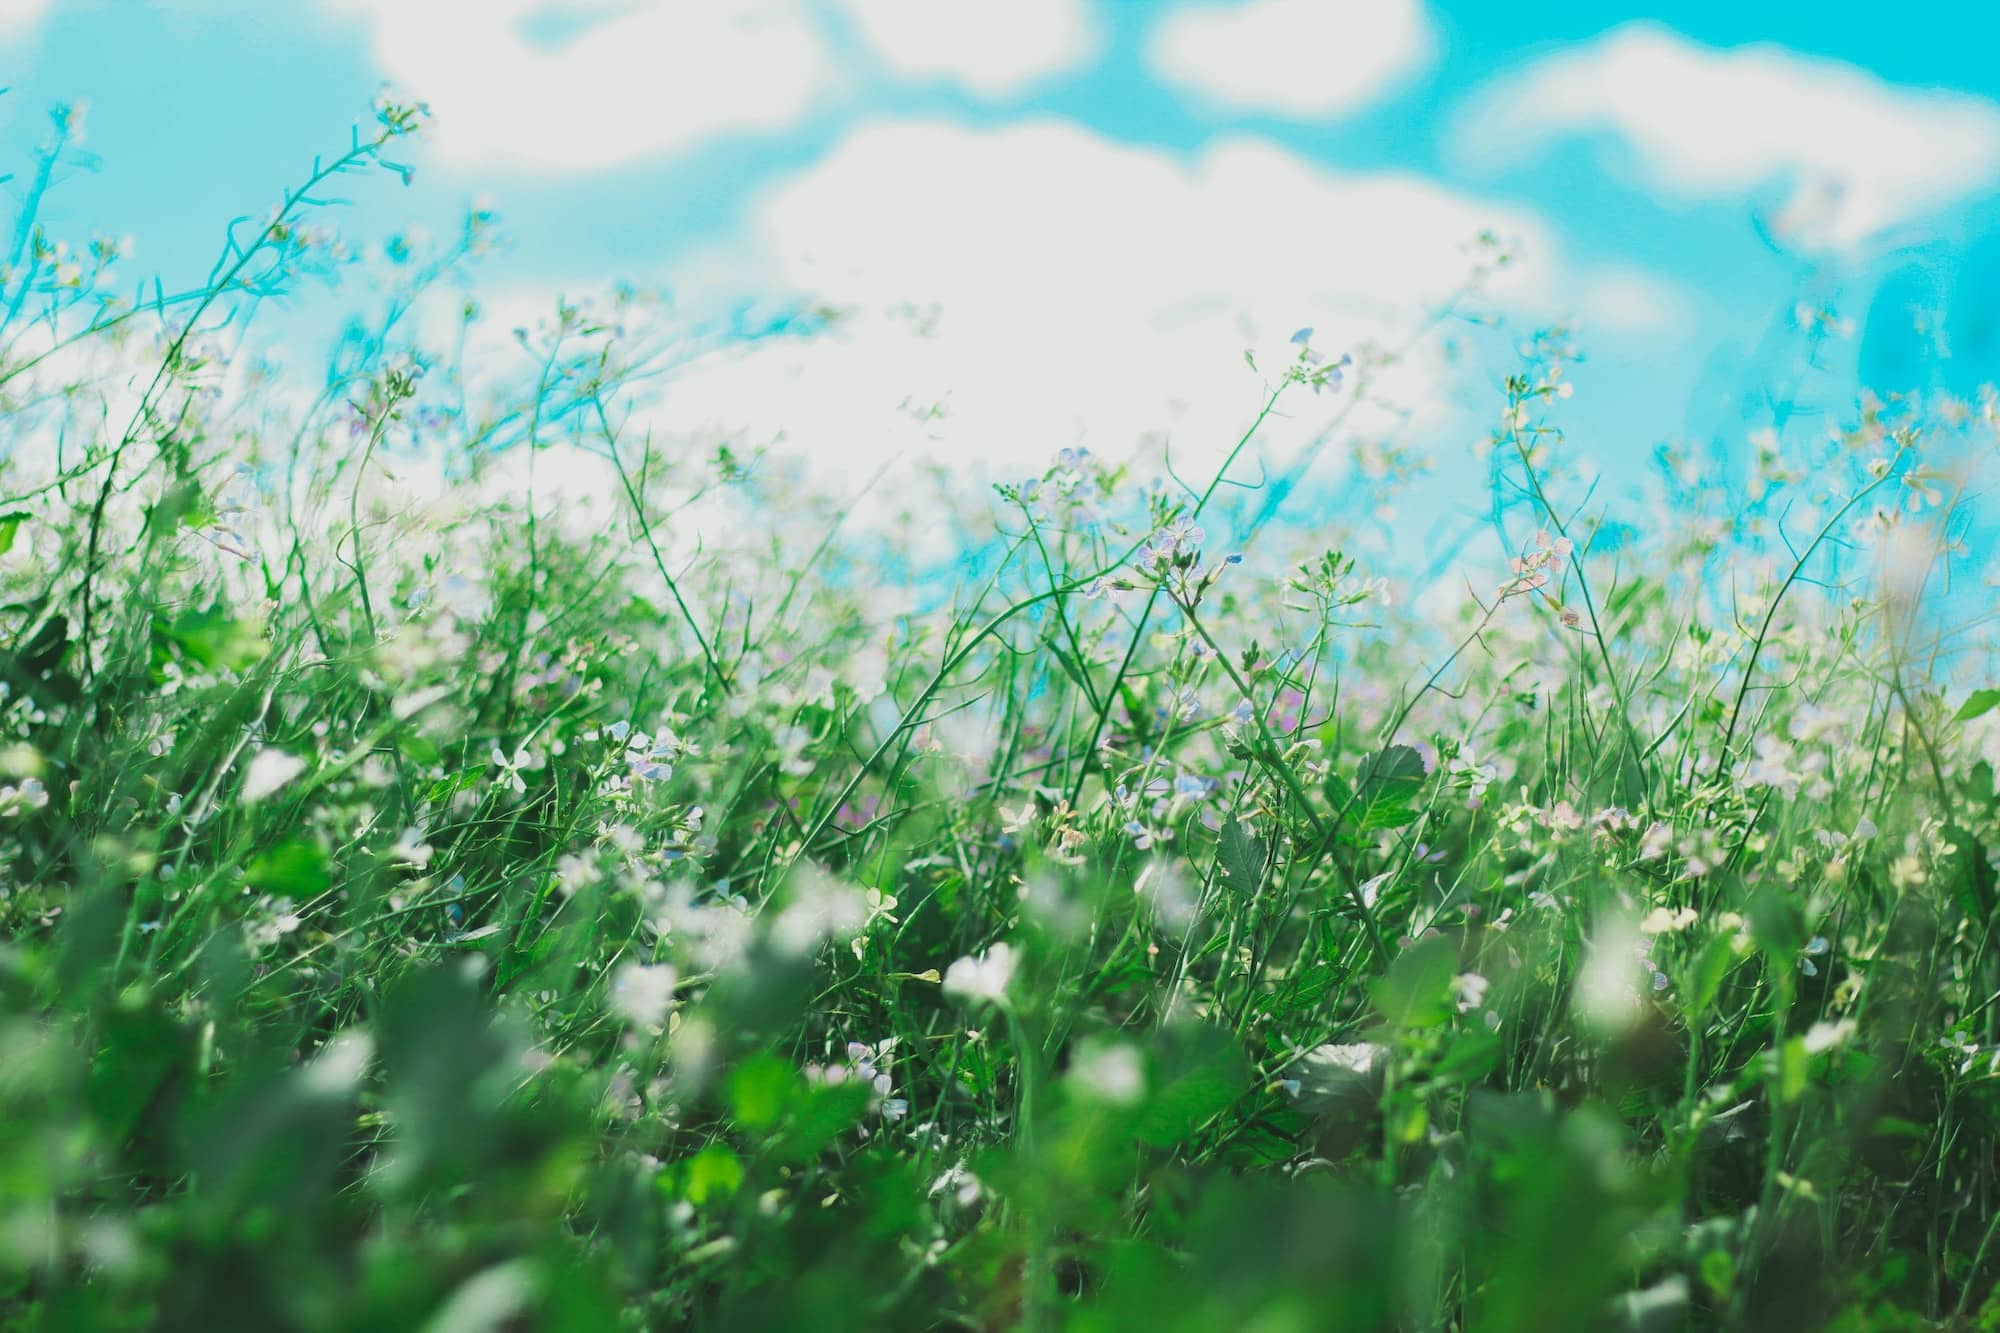 seasonal allergies - flowers in a field - high pollen count